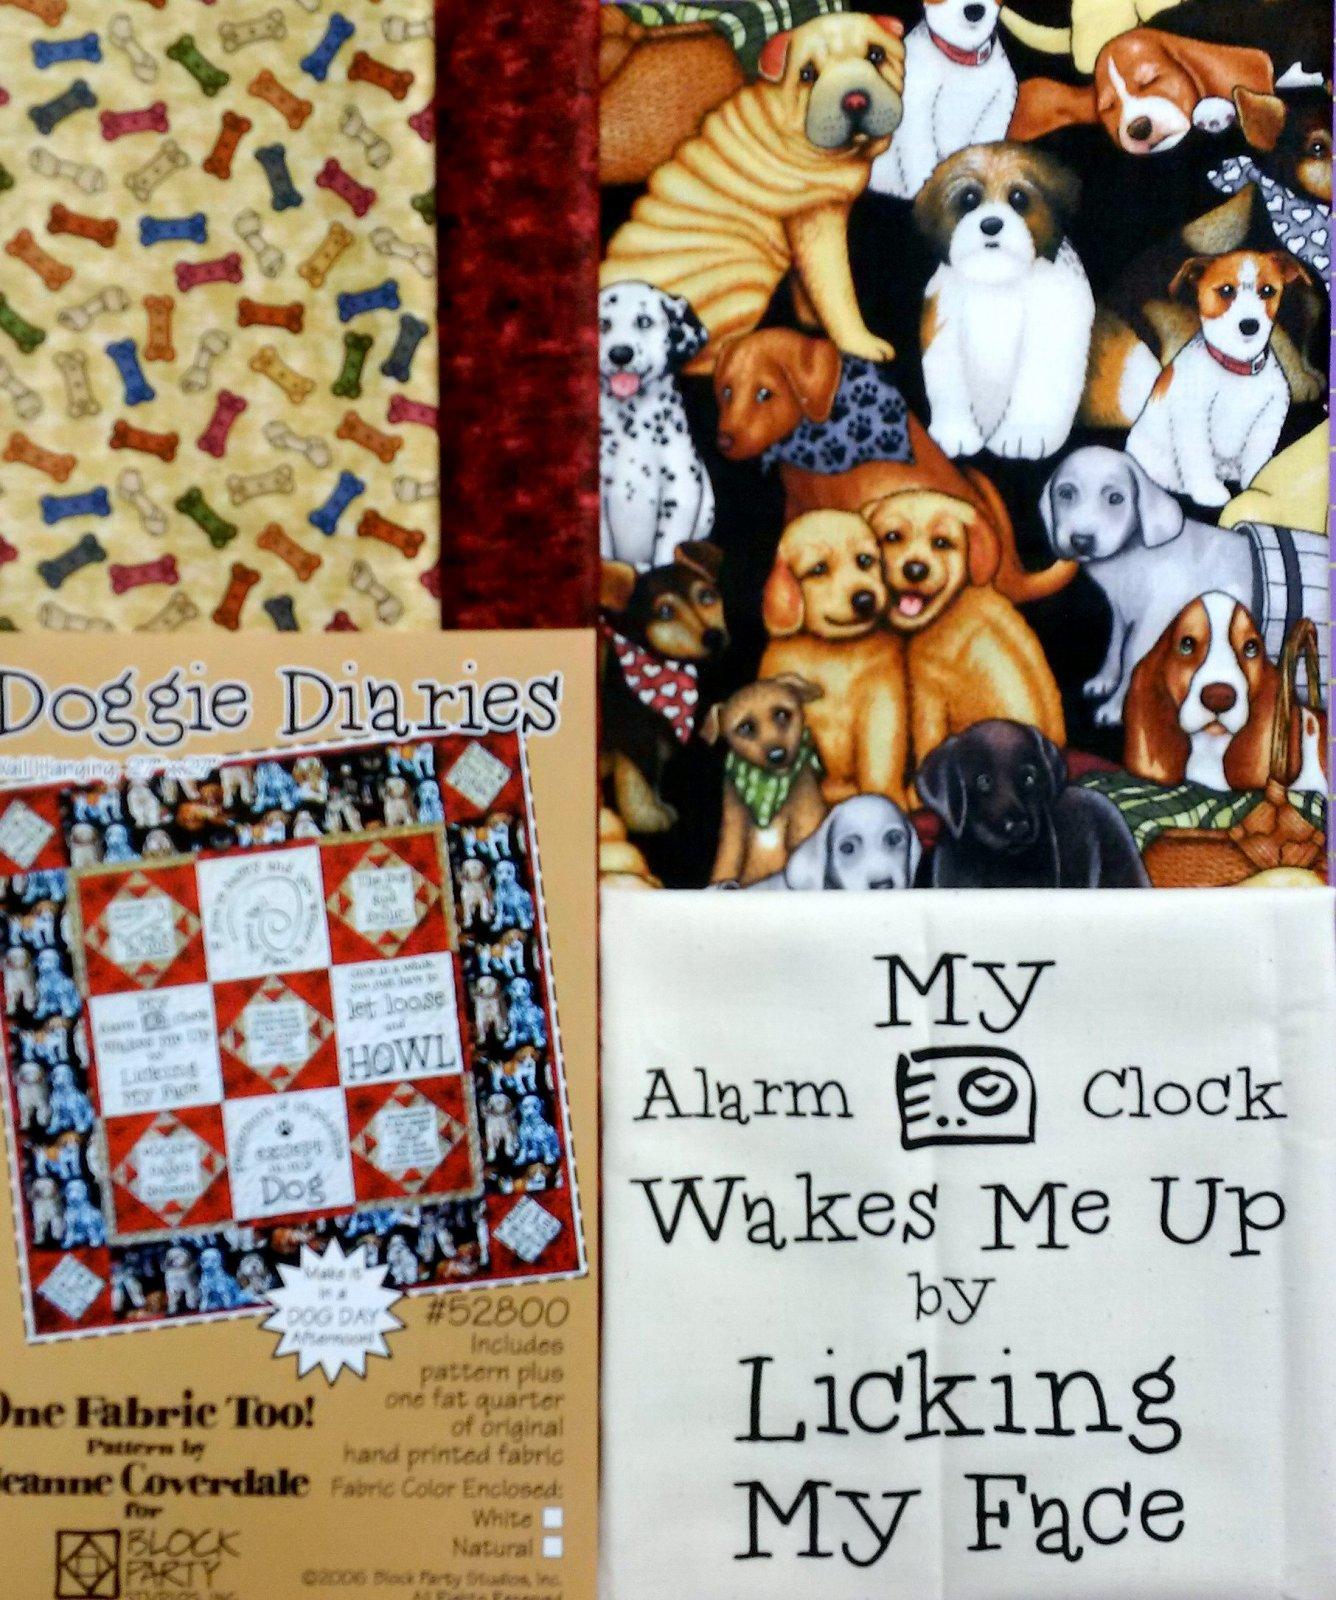 Doggie Diaries Quilt Kit